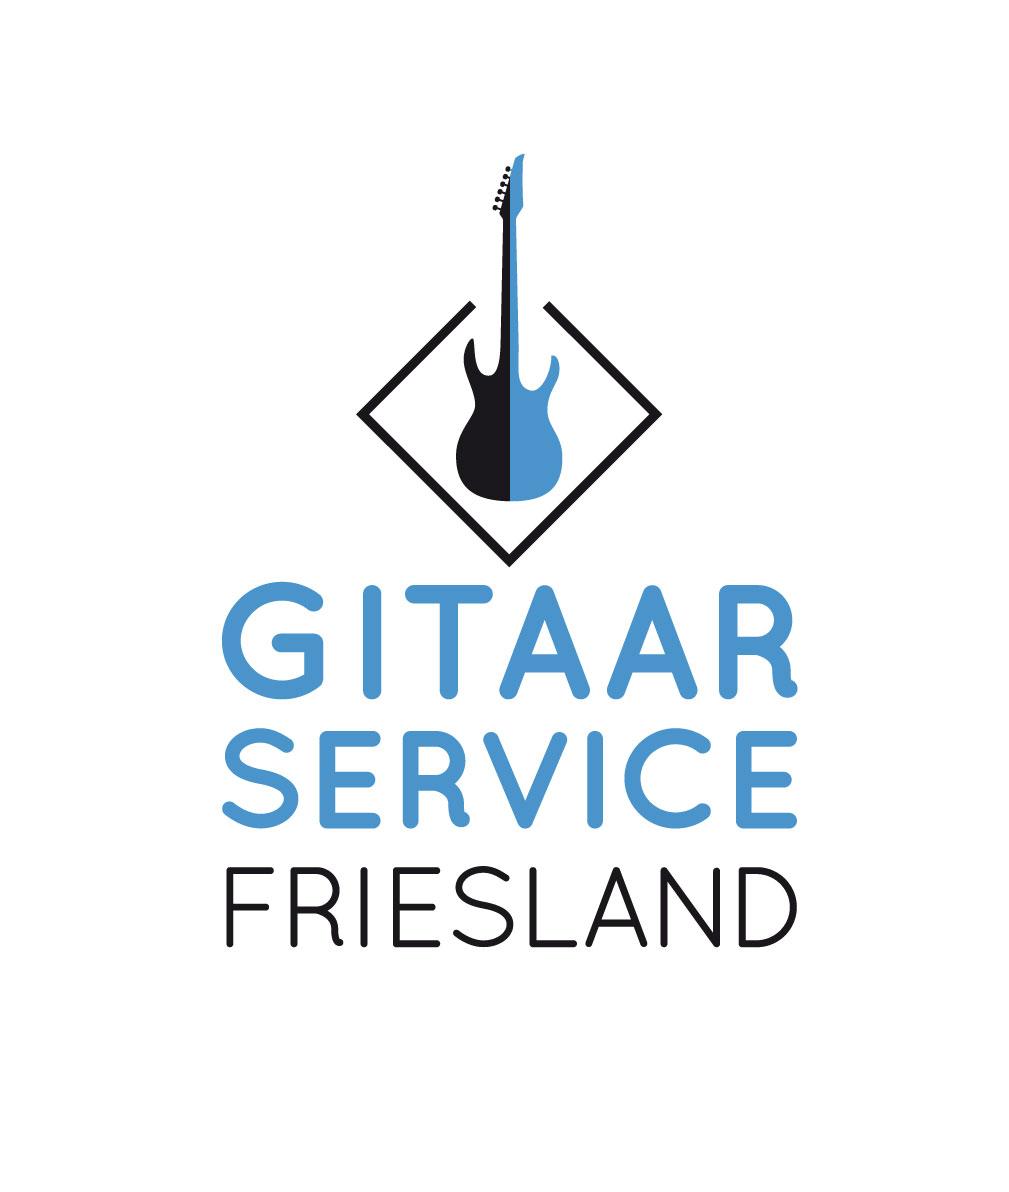 Gitaar Service